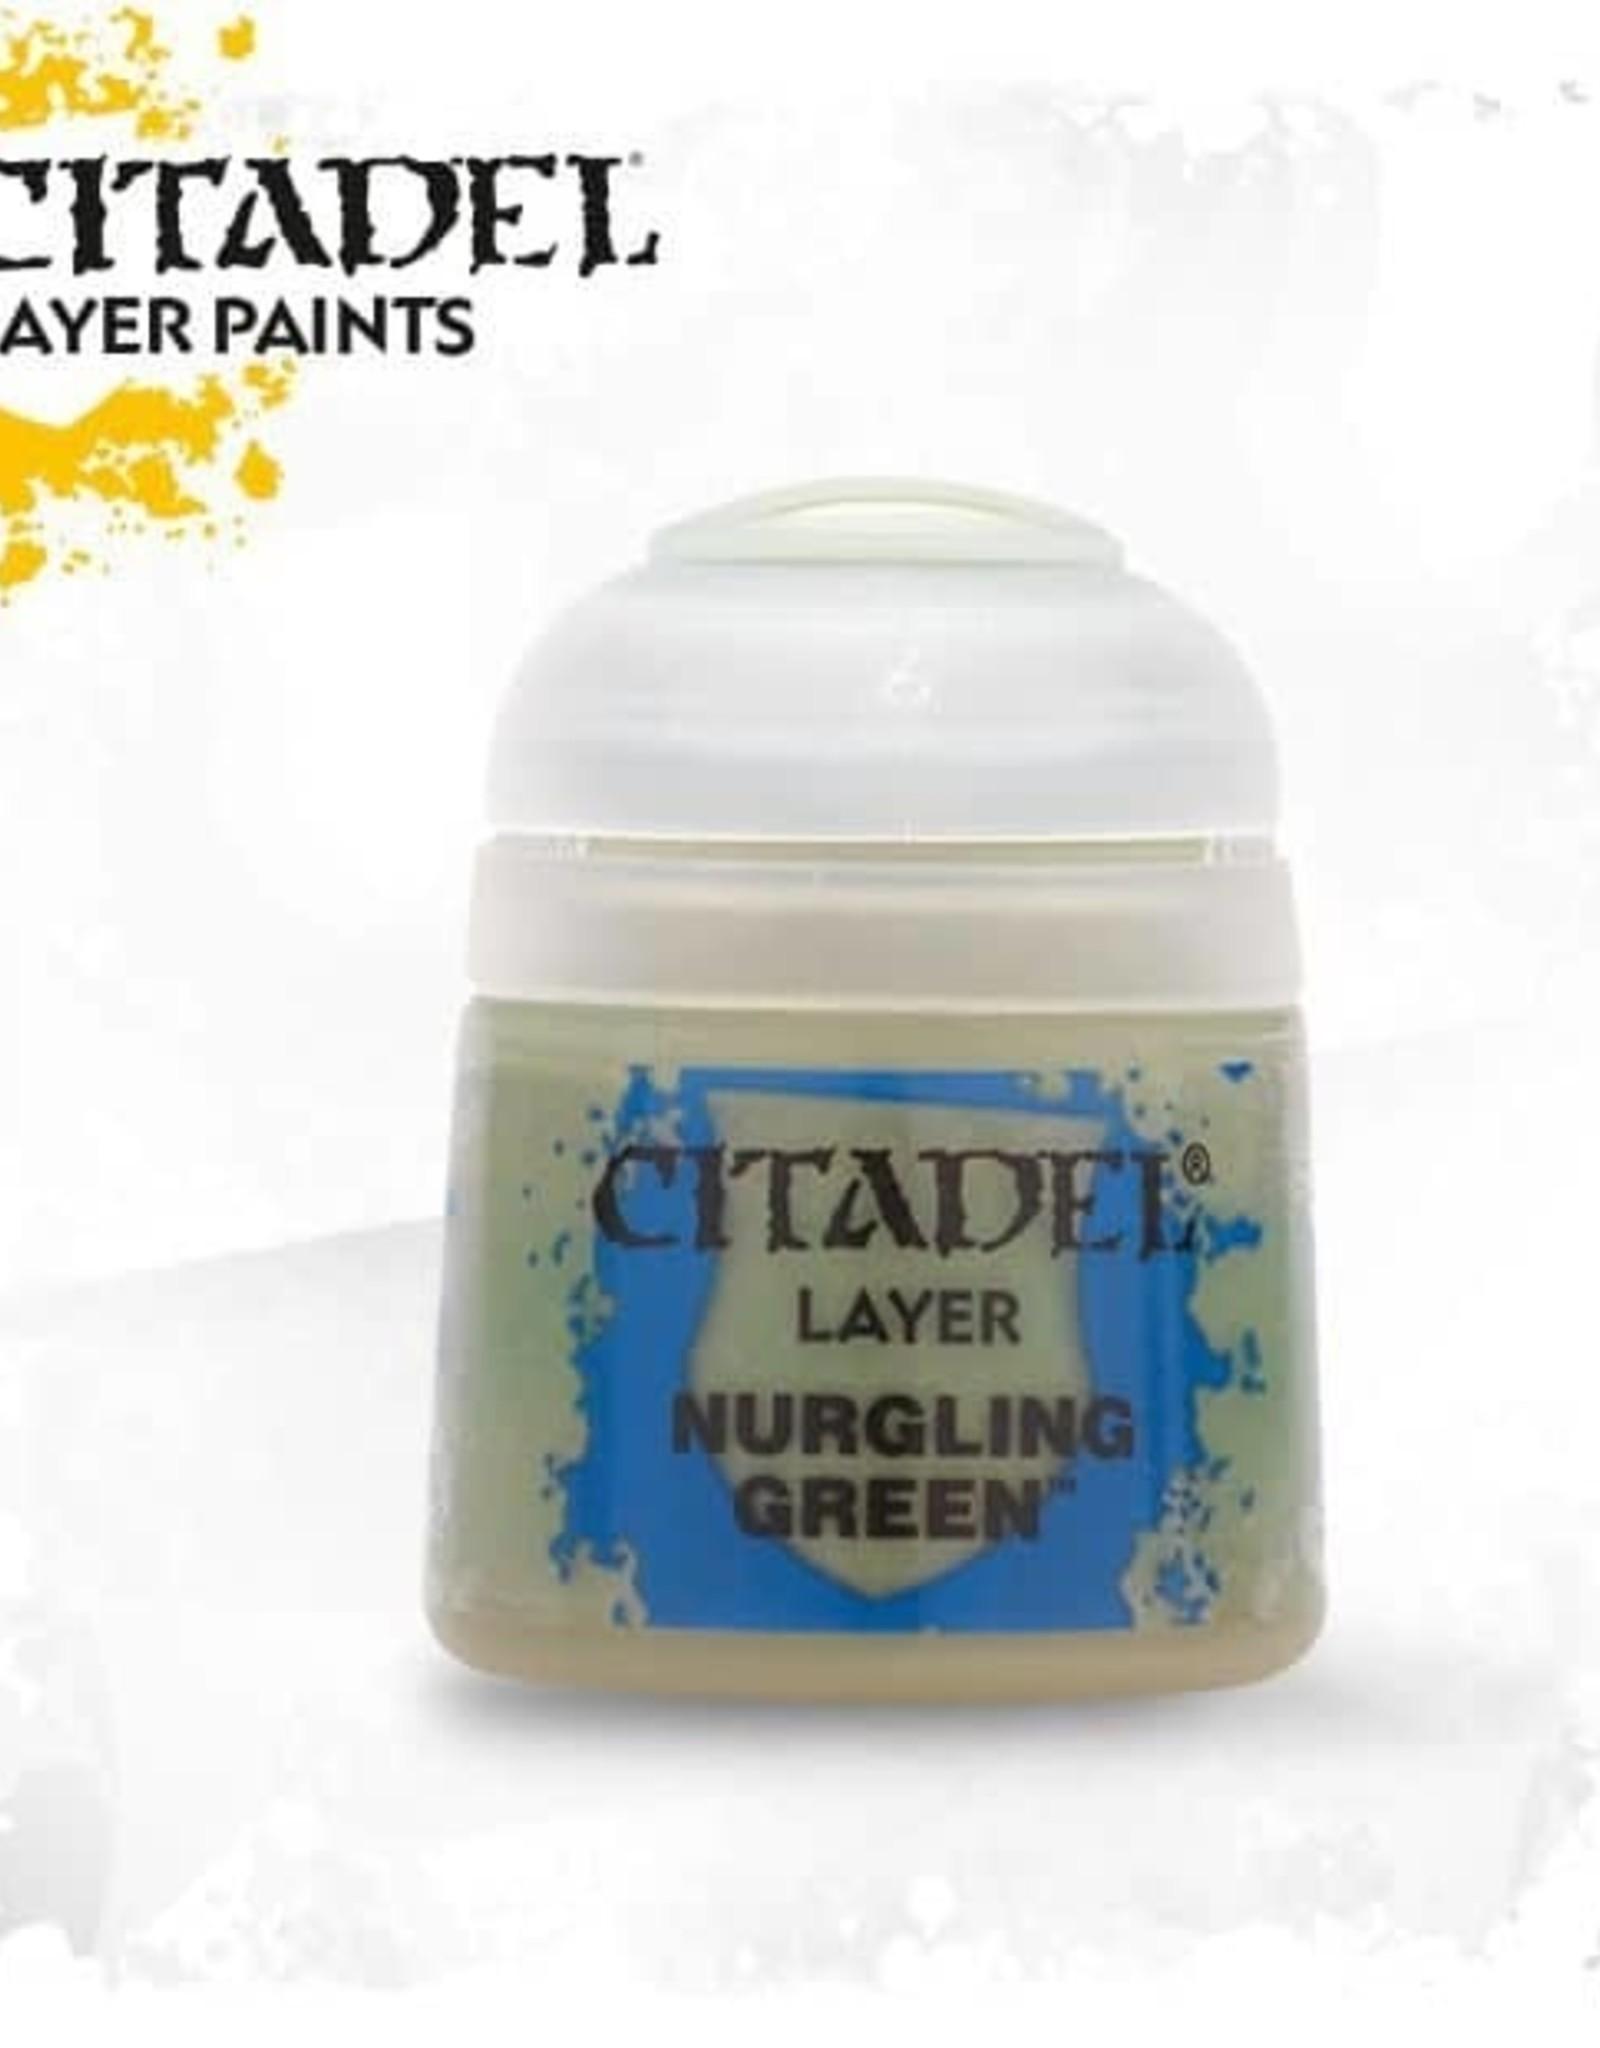 Games Workshop Citadel Paint: Layer - Nurgling Green